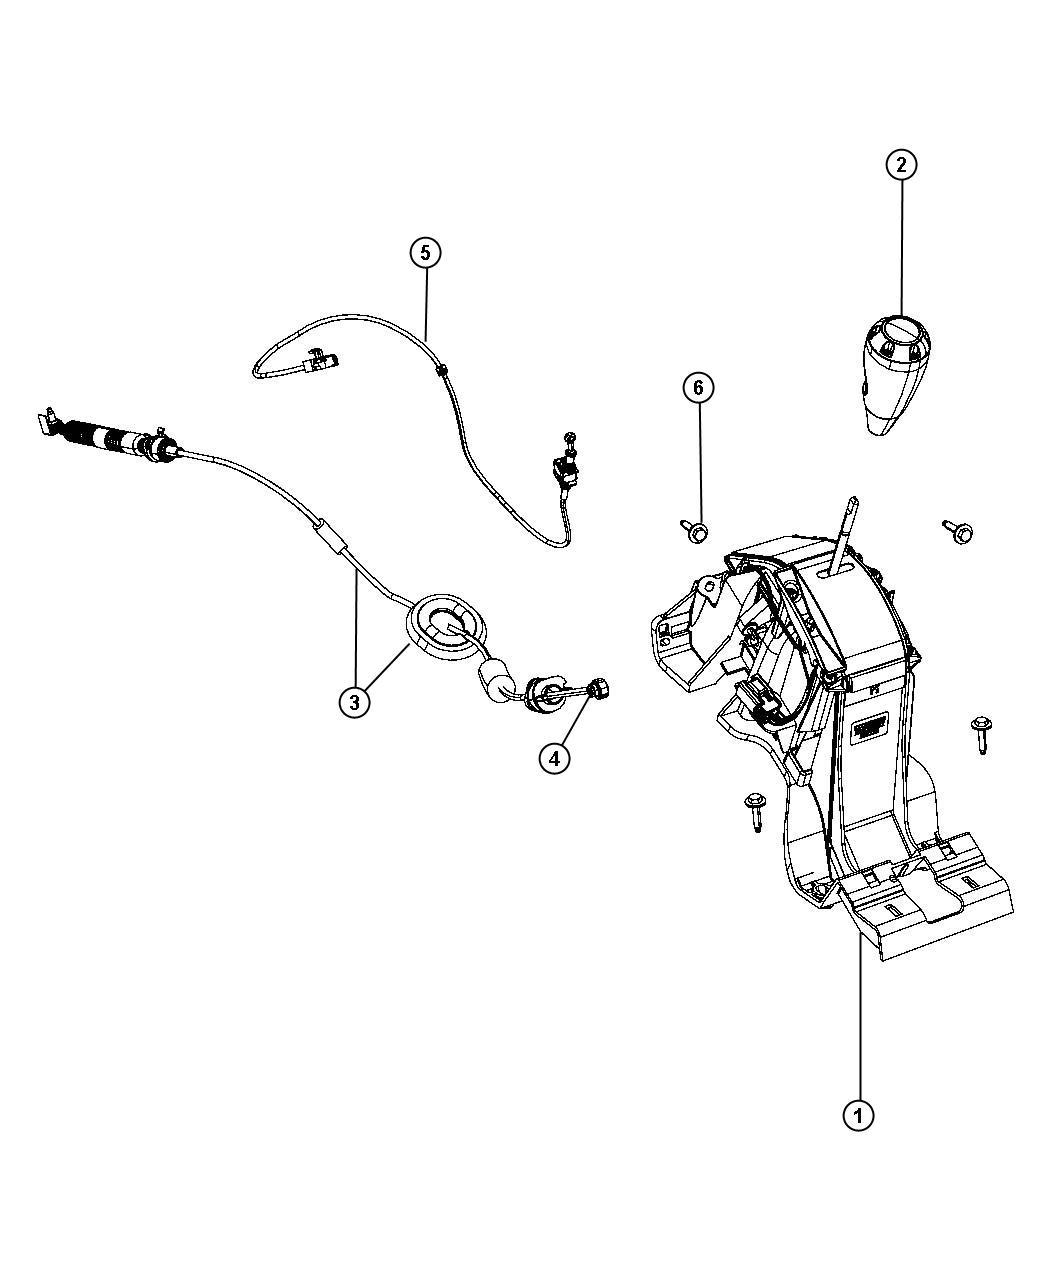 2008 Jeep Patriot Cable. Gear selector, ignition interlock